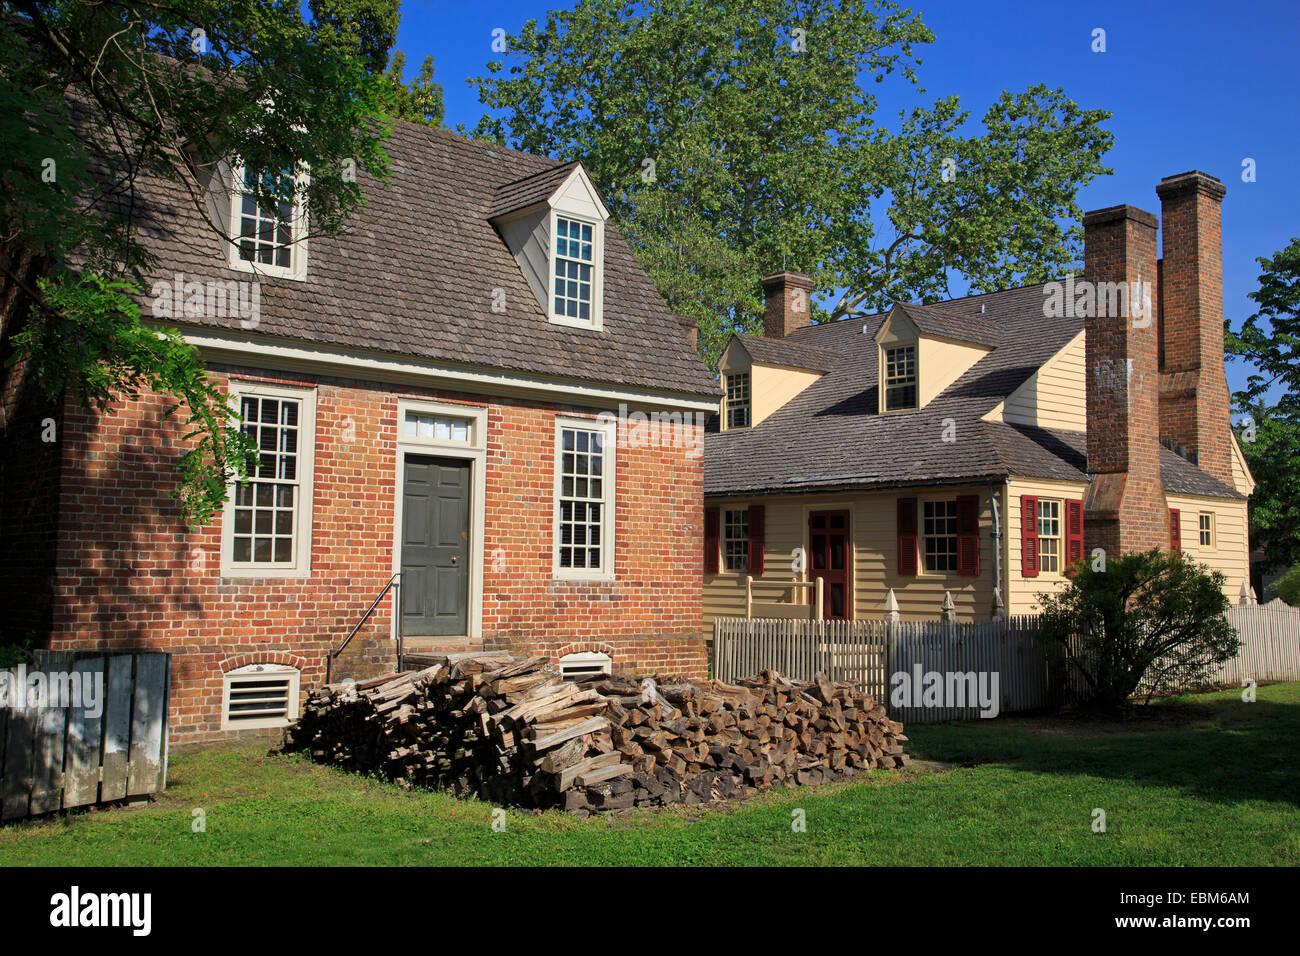 Williamsburg house stock photos williamsburg house stock for Virginia house